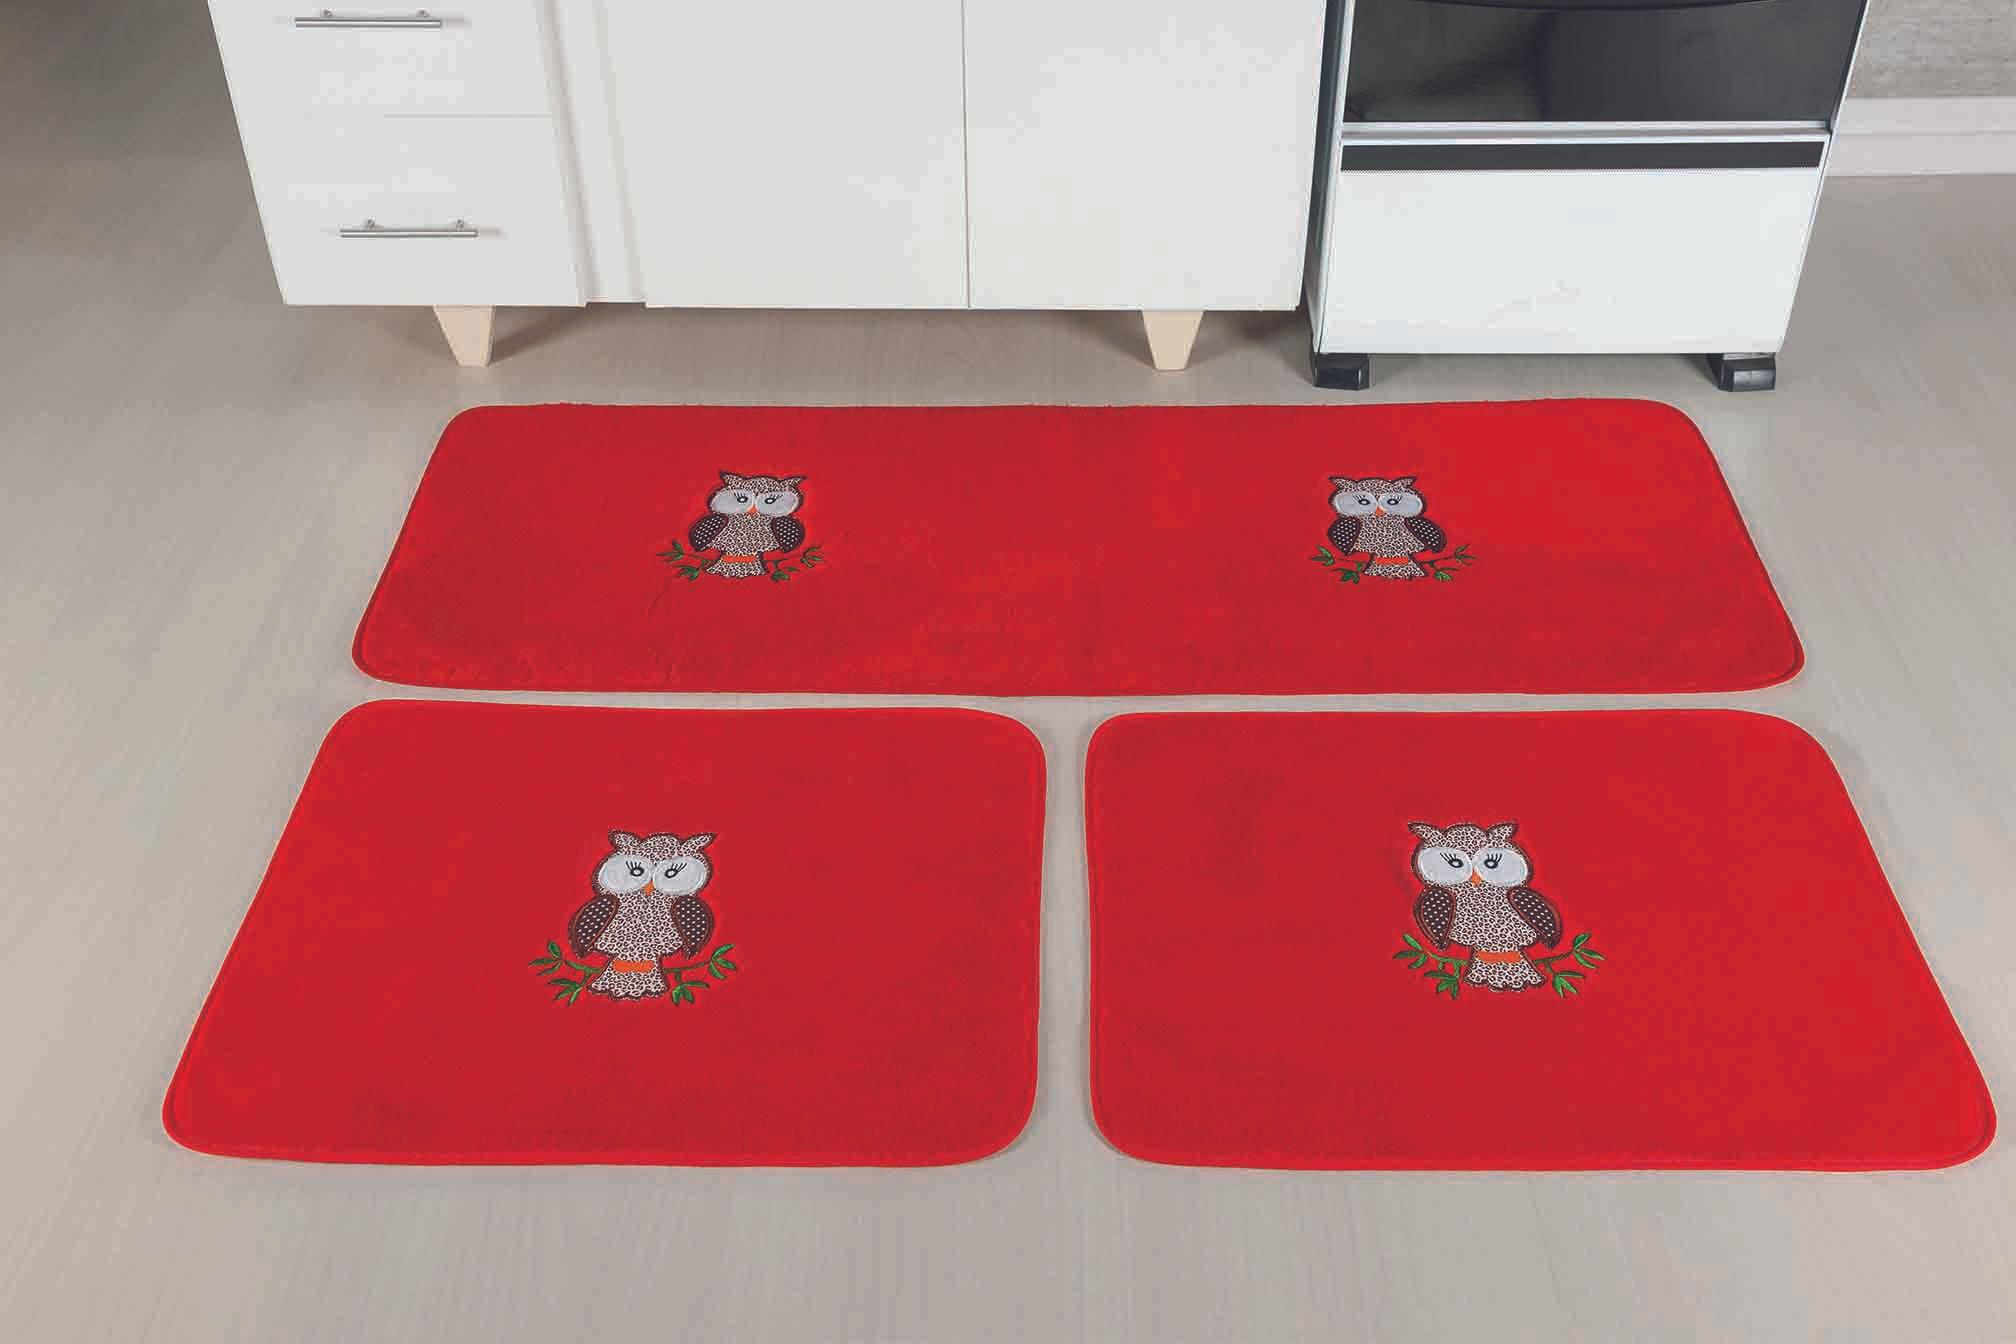 Kit de Cozinha Premium Coruja Vermelho Guga Tapetes